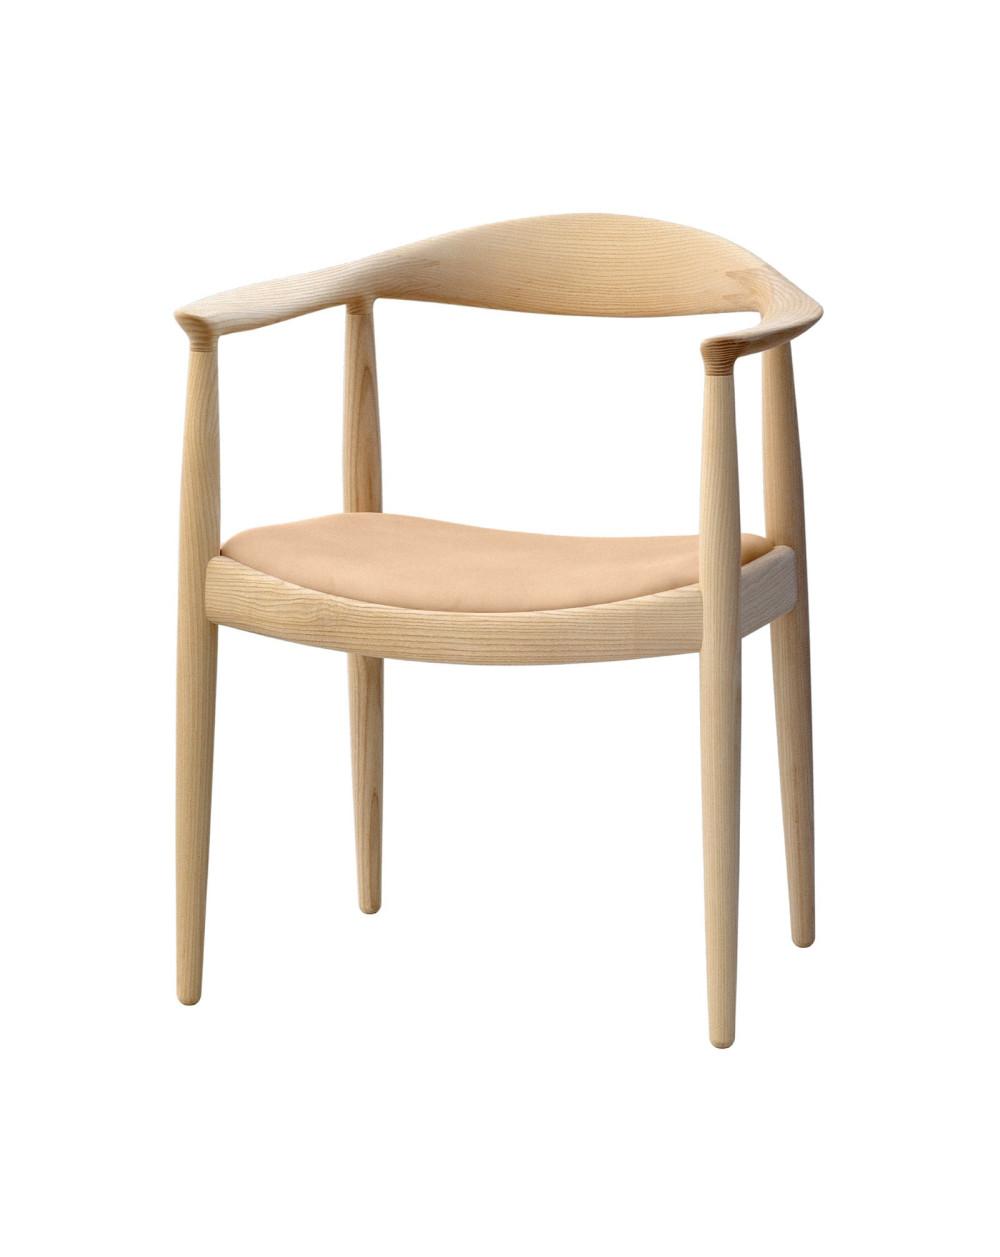 chaise ic ne design hans wegner la boutique danoise. Black Bedroom Furniture Sets. Home Design Ideas